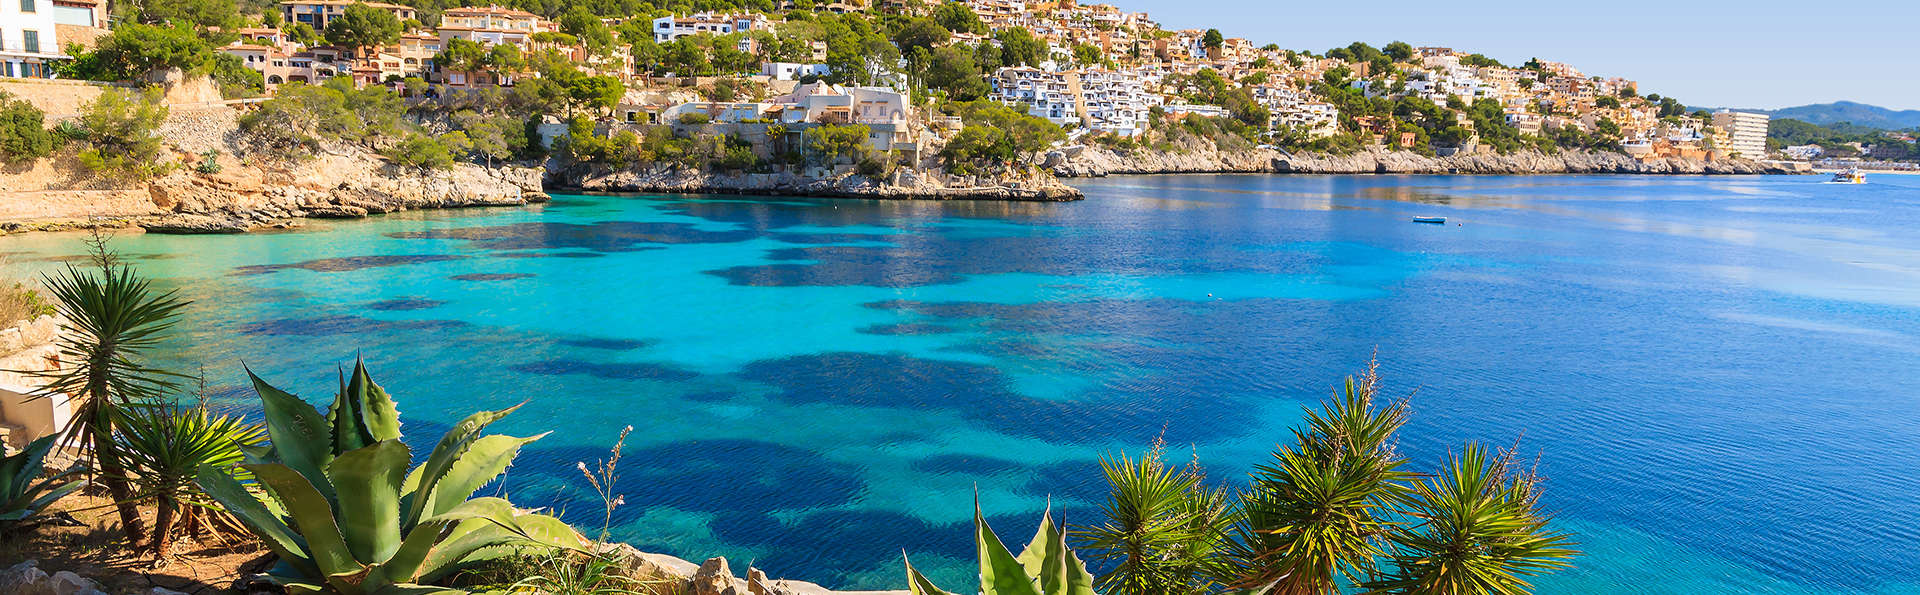 THB Hotel Sur Mallorca - Edit_Mallorca2.jpg